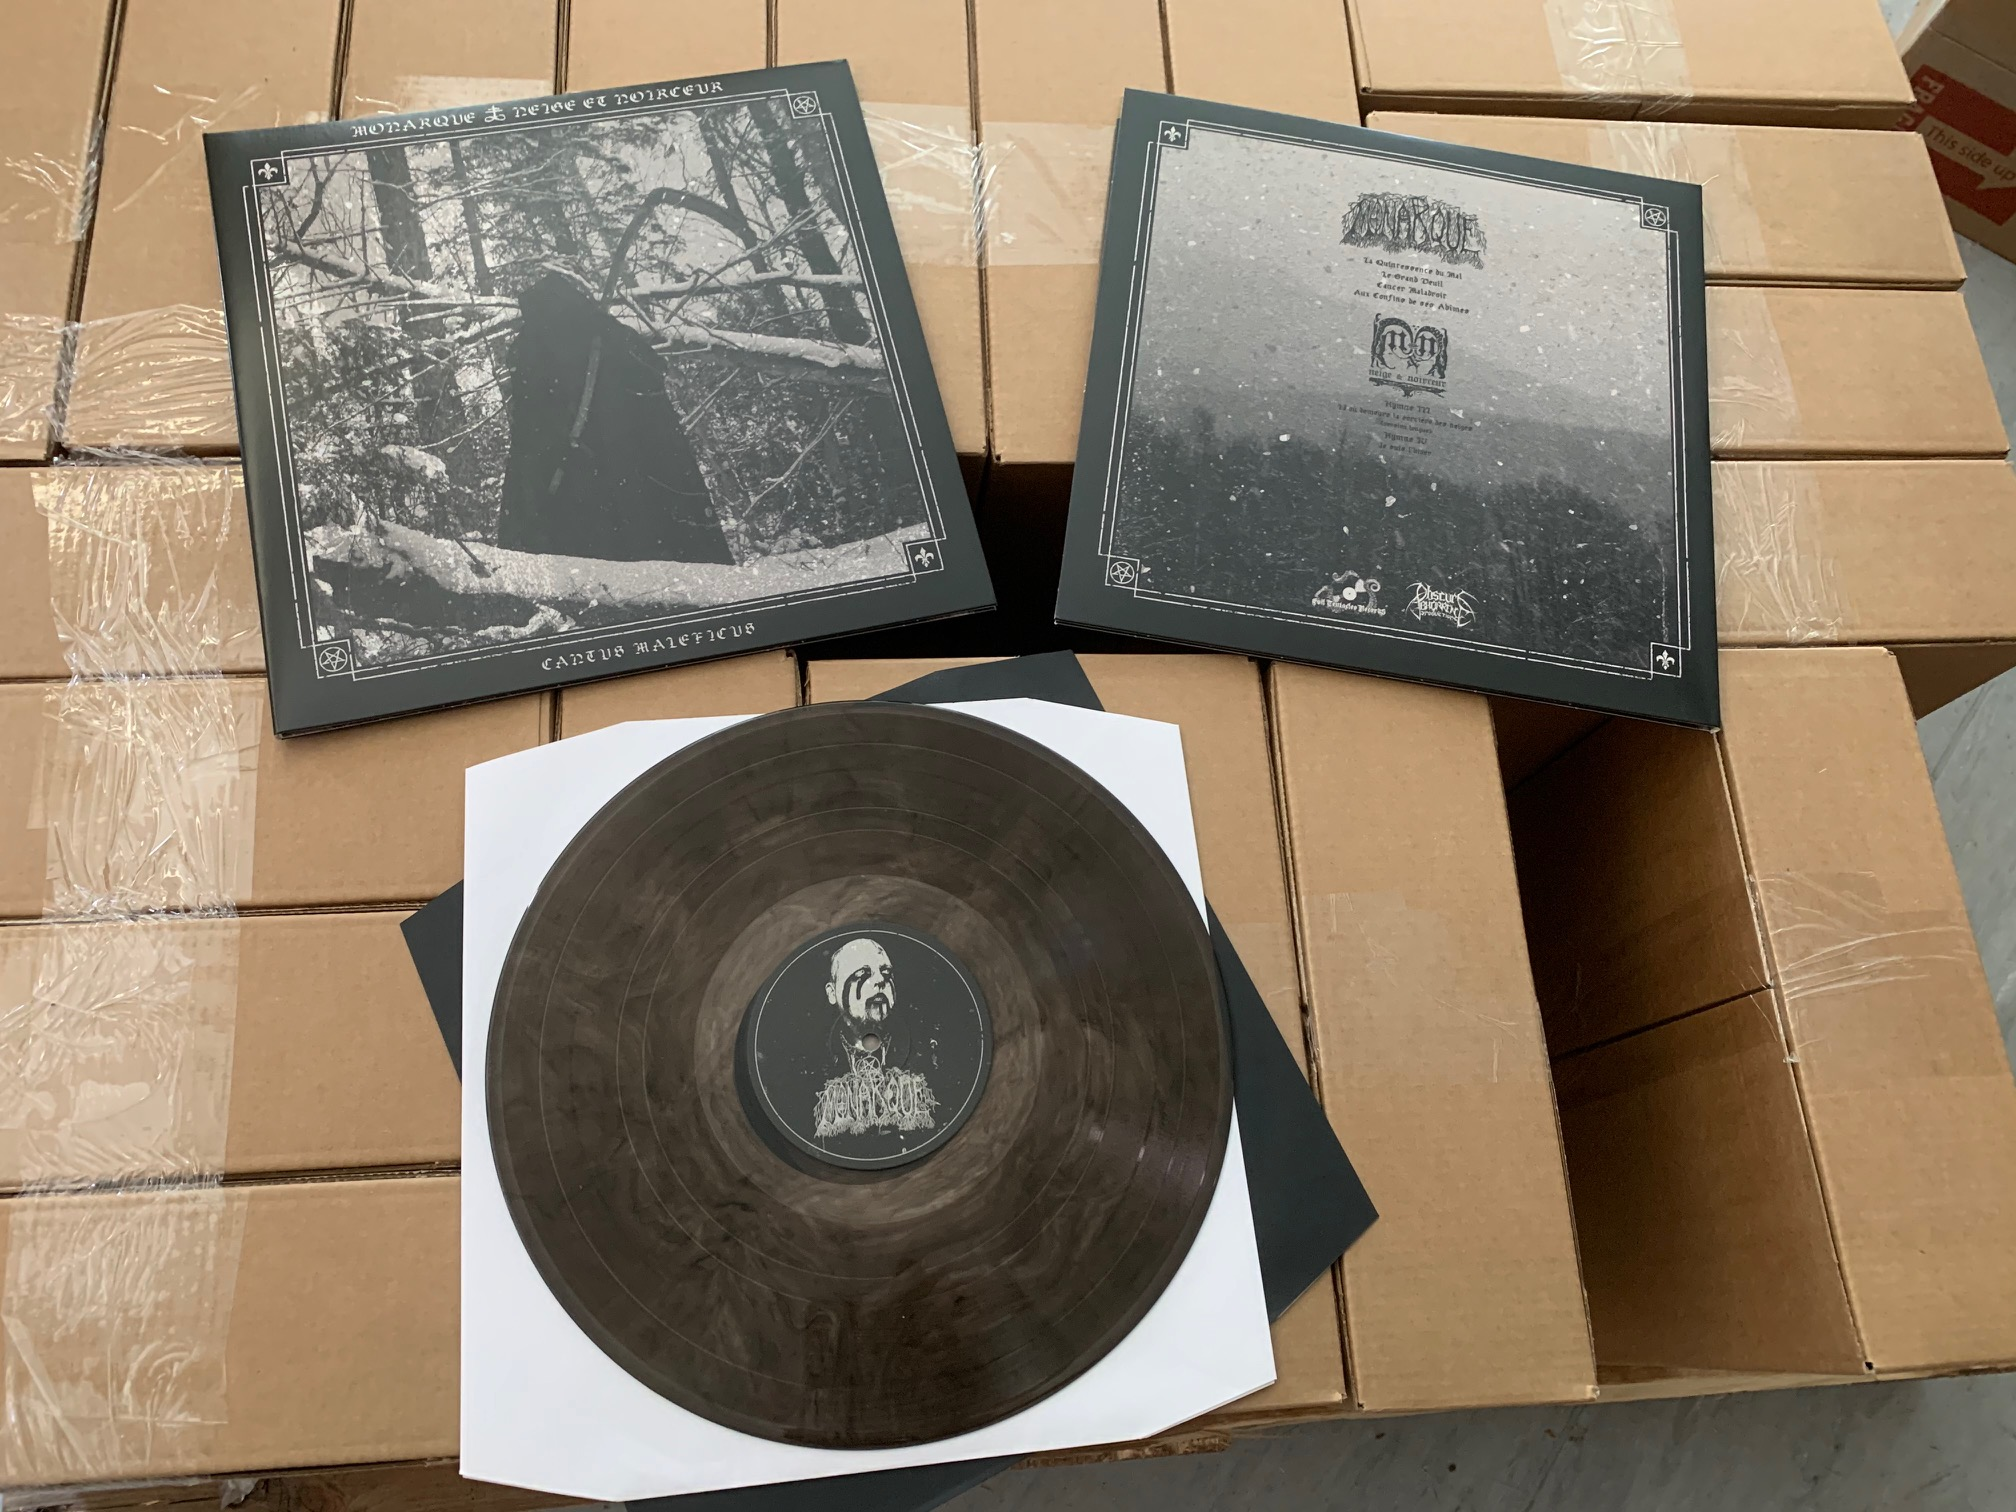 Monarque / Neige & Noirceur - Cantus Maleficus (Black smokey vinyl)